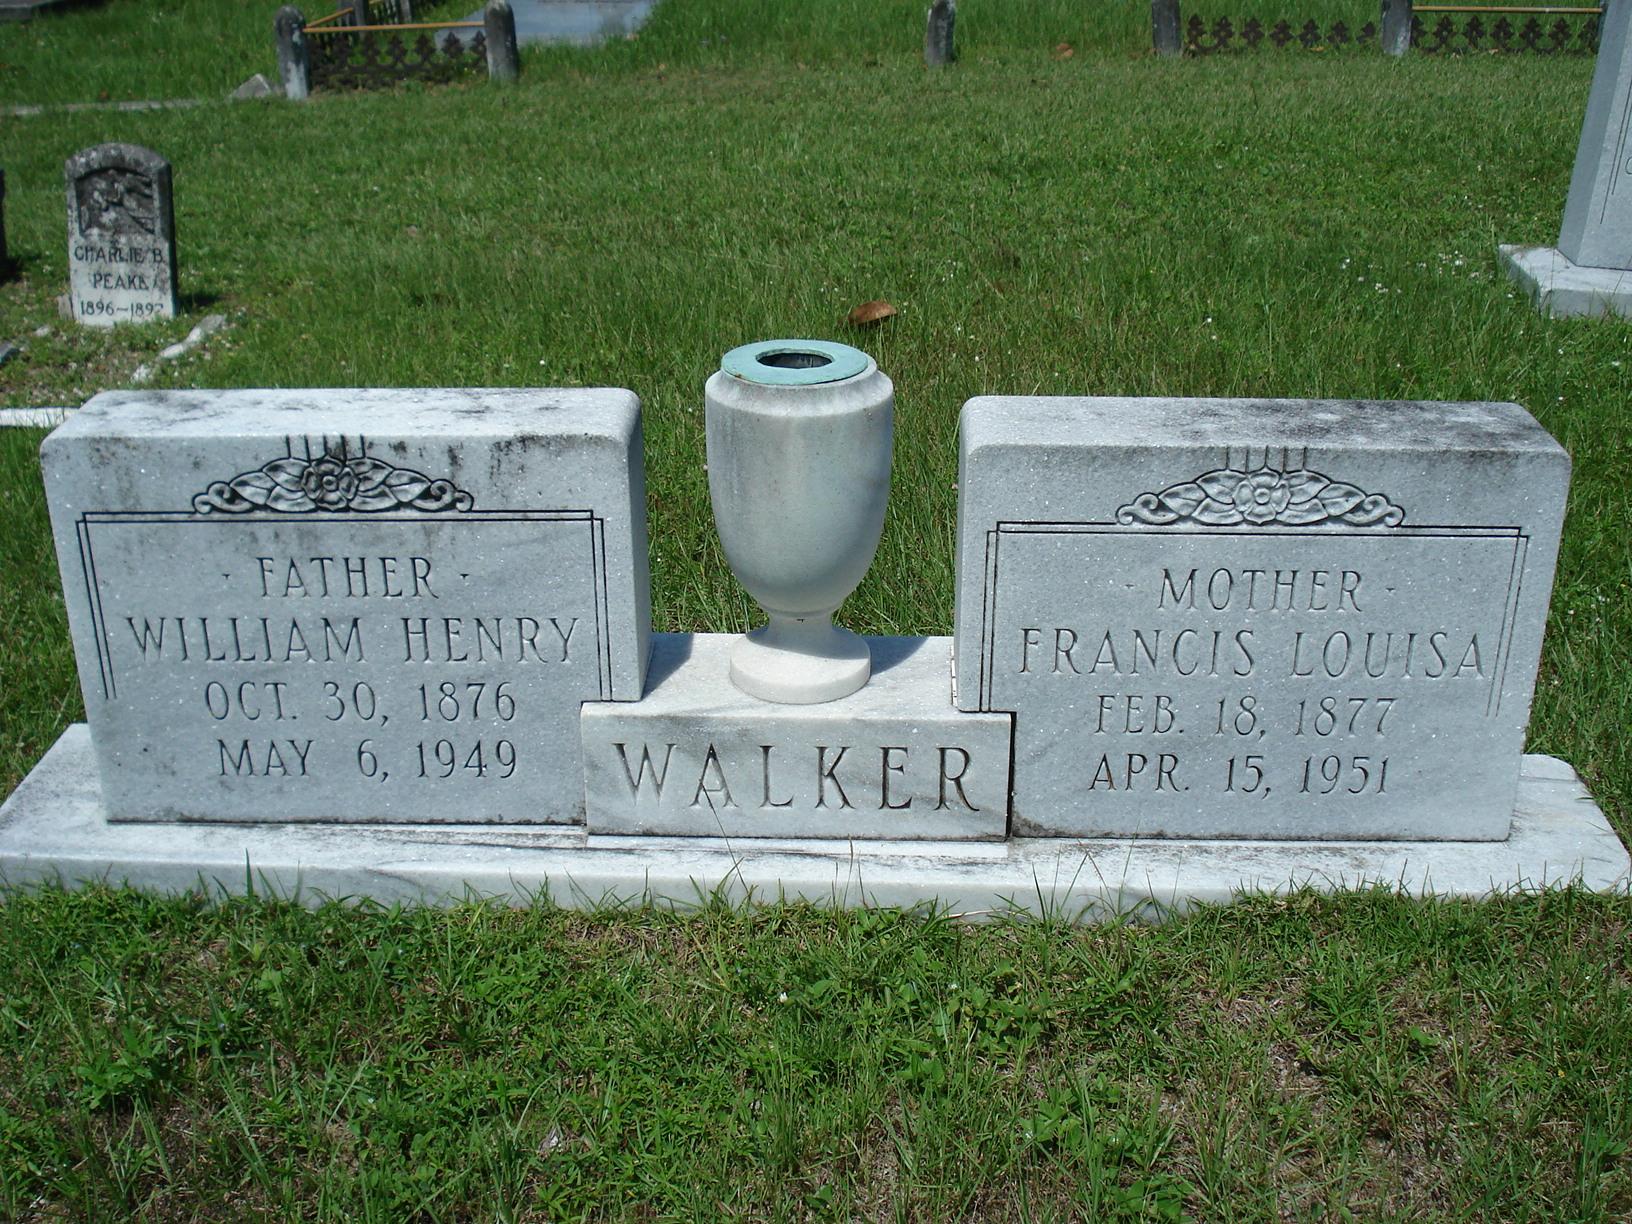 William Henry Walker